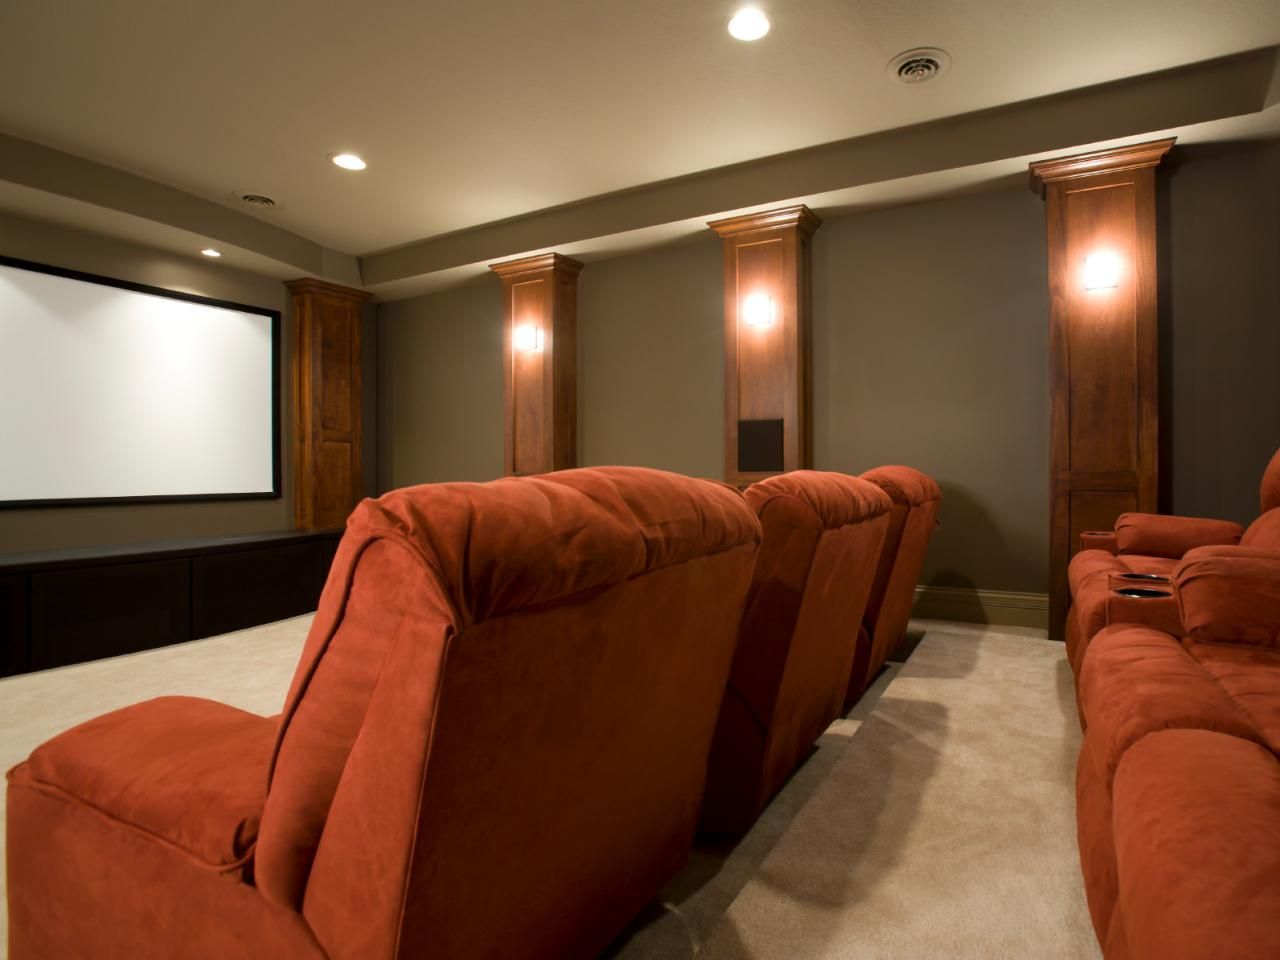 Home cinema diy projects